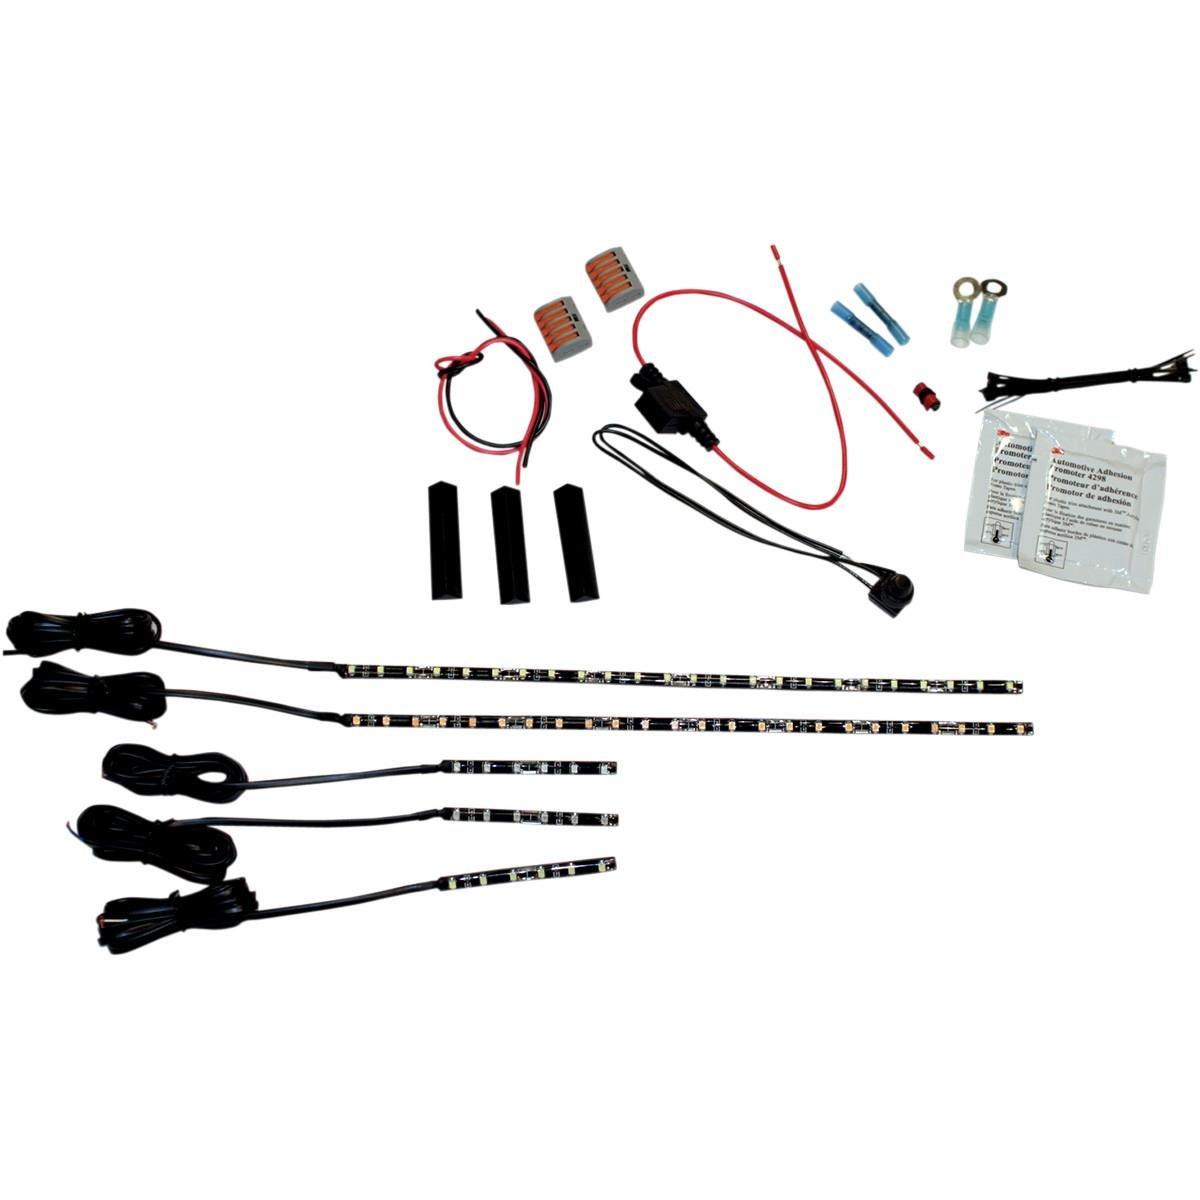 Custom Dynamics MagixFLEX LED Engine Kit for Sportbikes - Red MFSB1RED